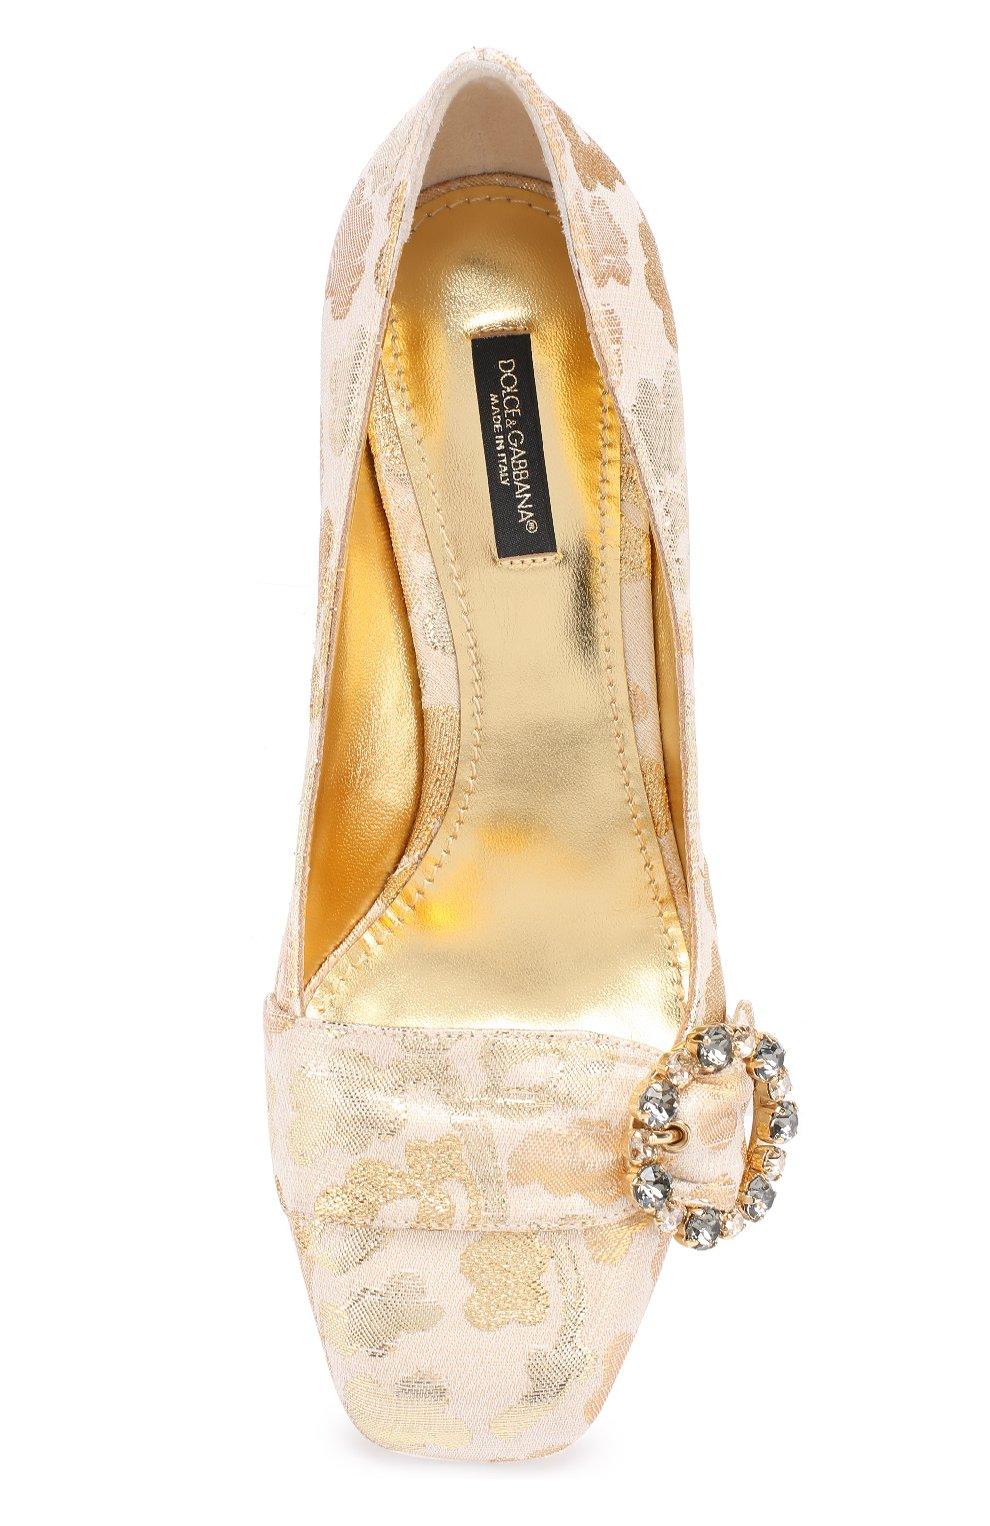 Парчовые туфли Jackie на фигурном каблуке | Фото №4